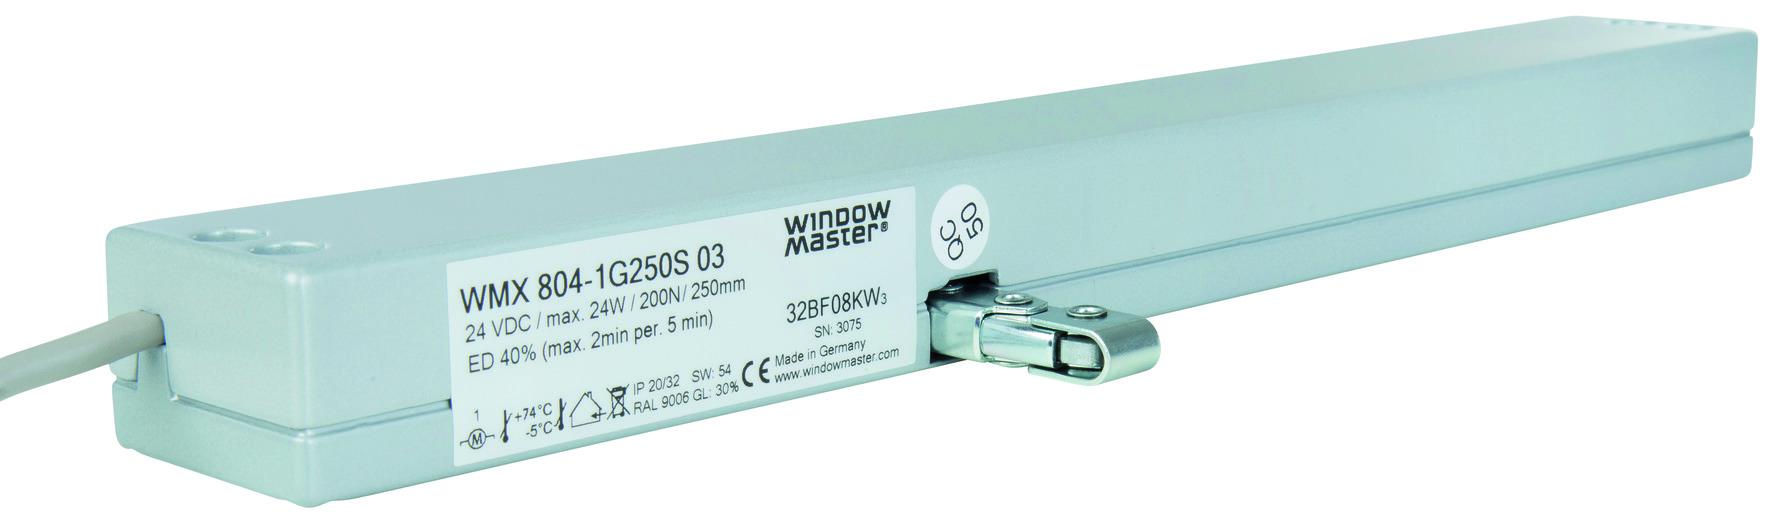 Kettenantrieb WINDOWMASTER WMX 804